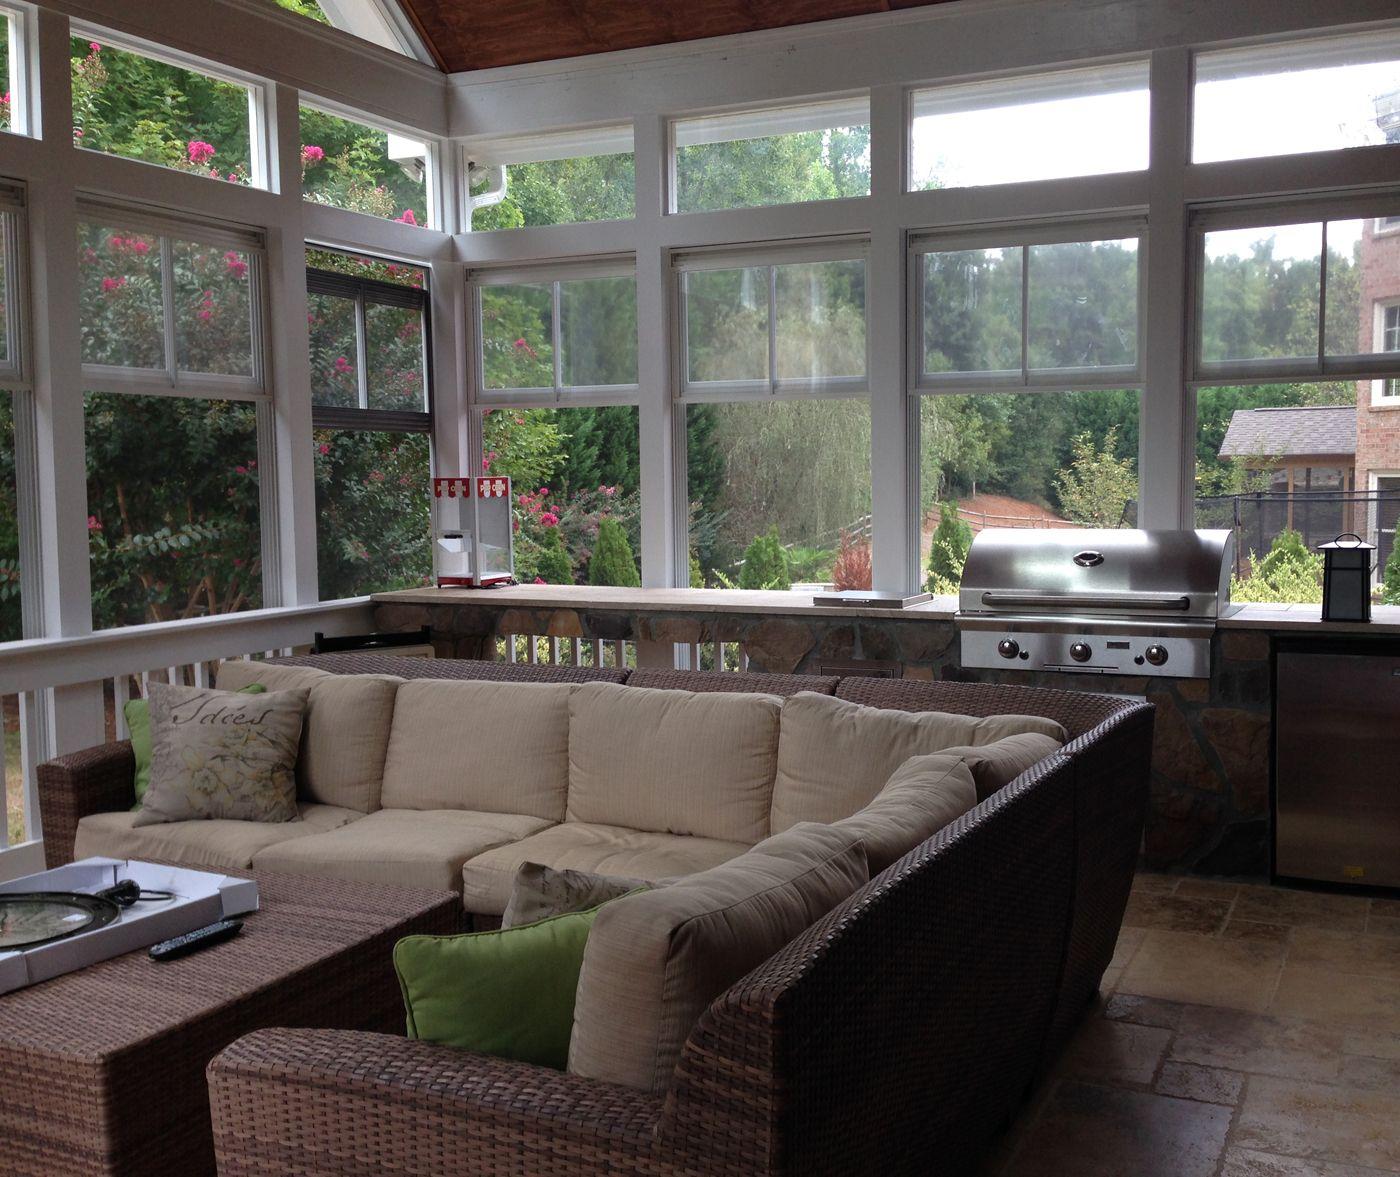 3 Season Porch In Wake Forest With Outdoor Kitchen 3 Season Room Porch Windows Porch Design